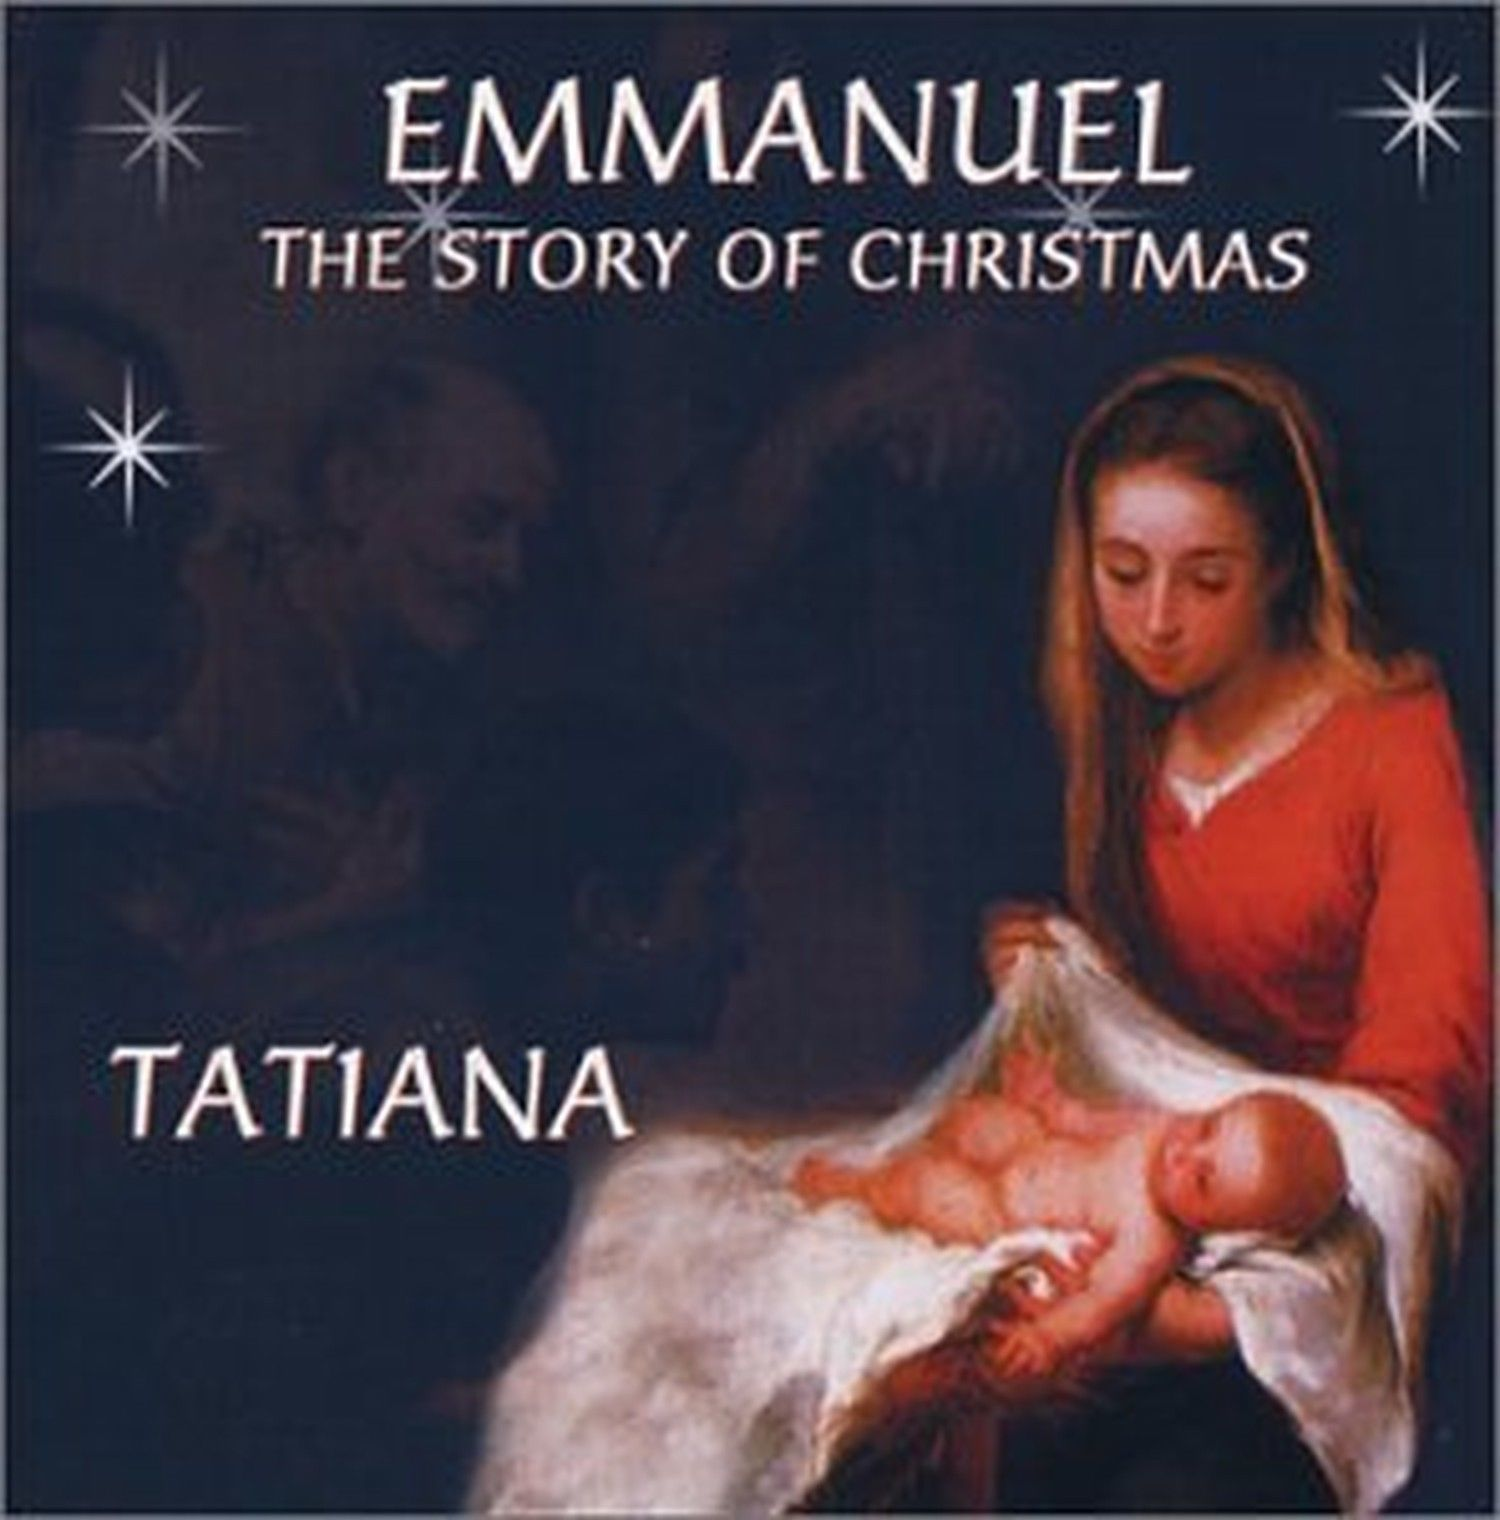 The story of christmas  emmanuel  feat. sanya by tatiana